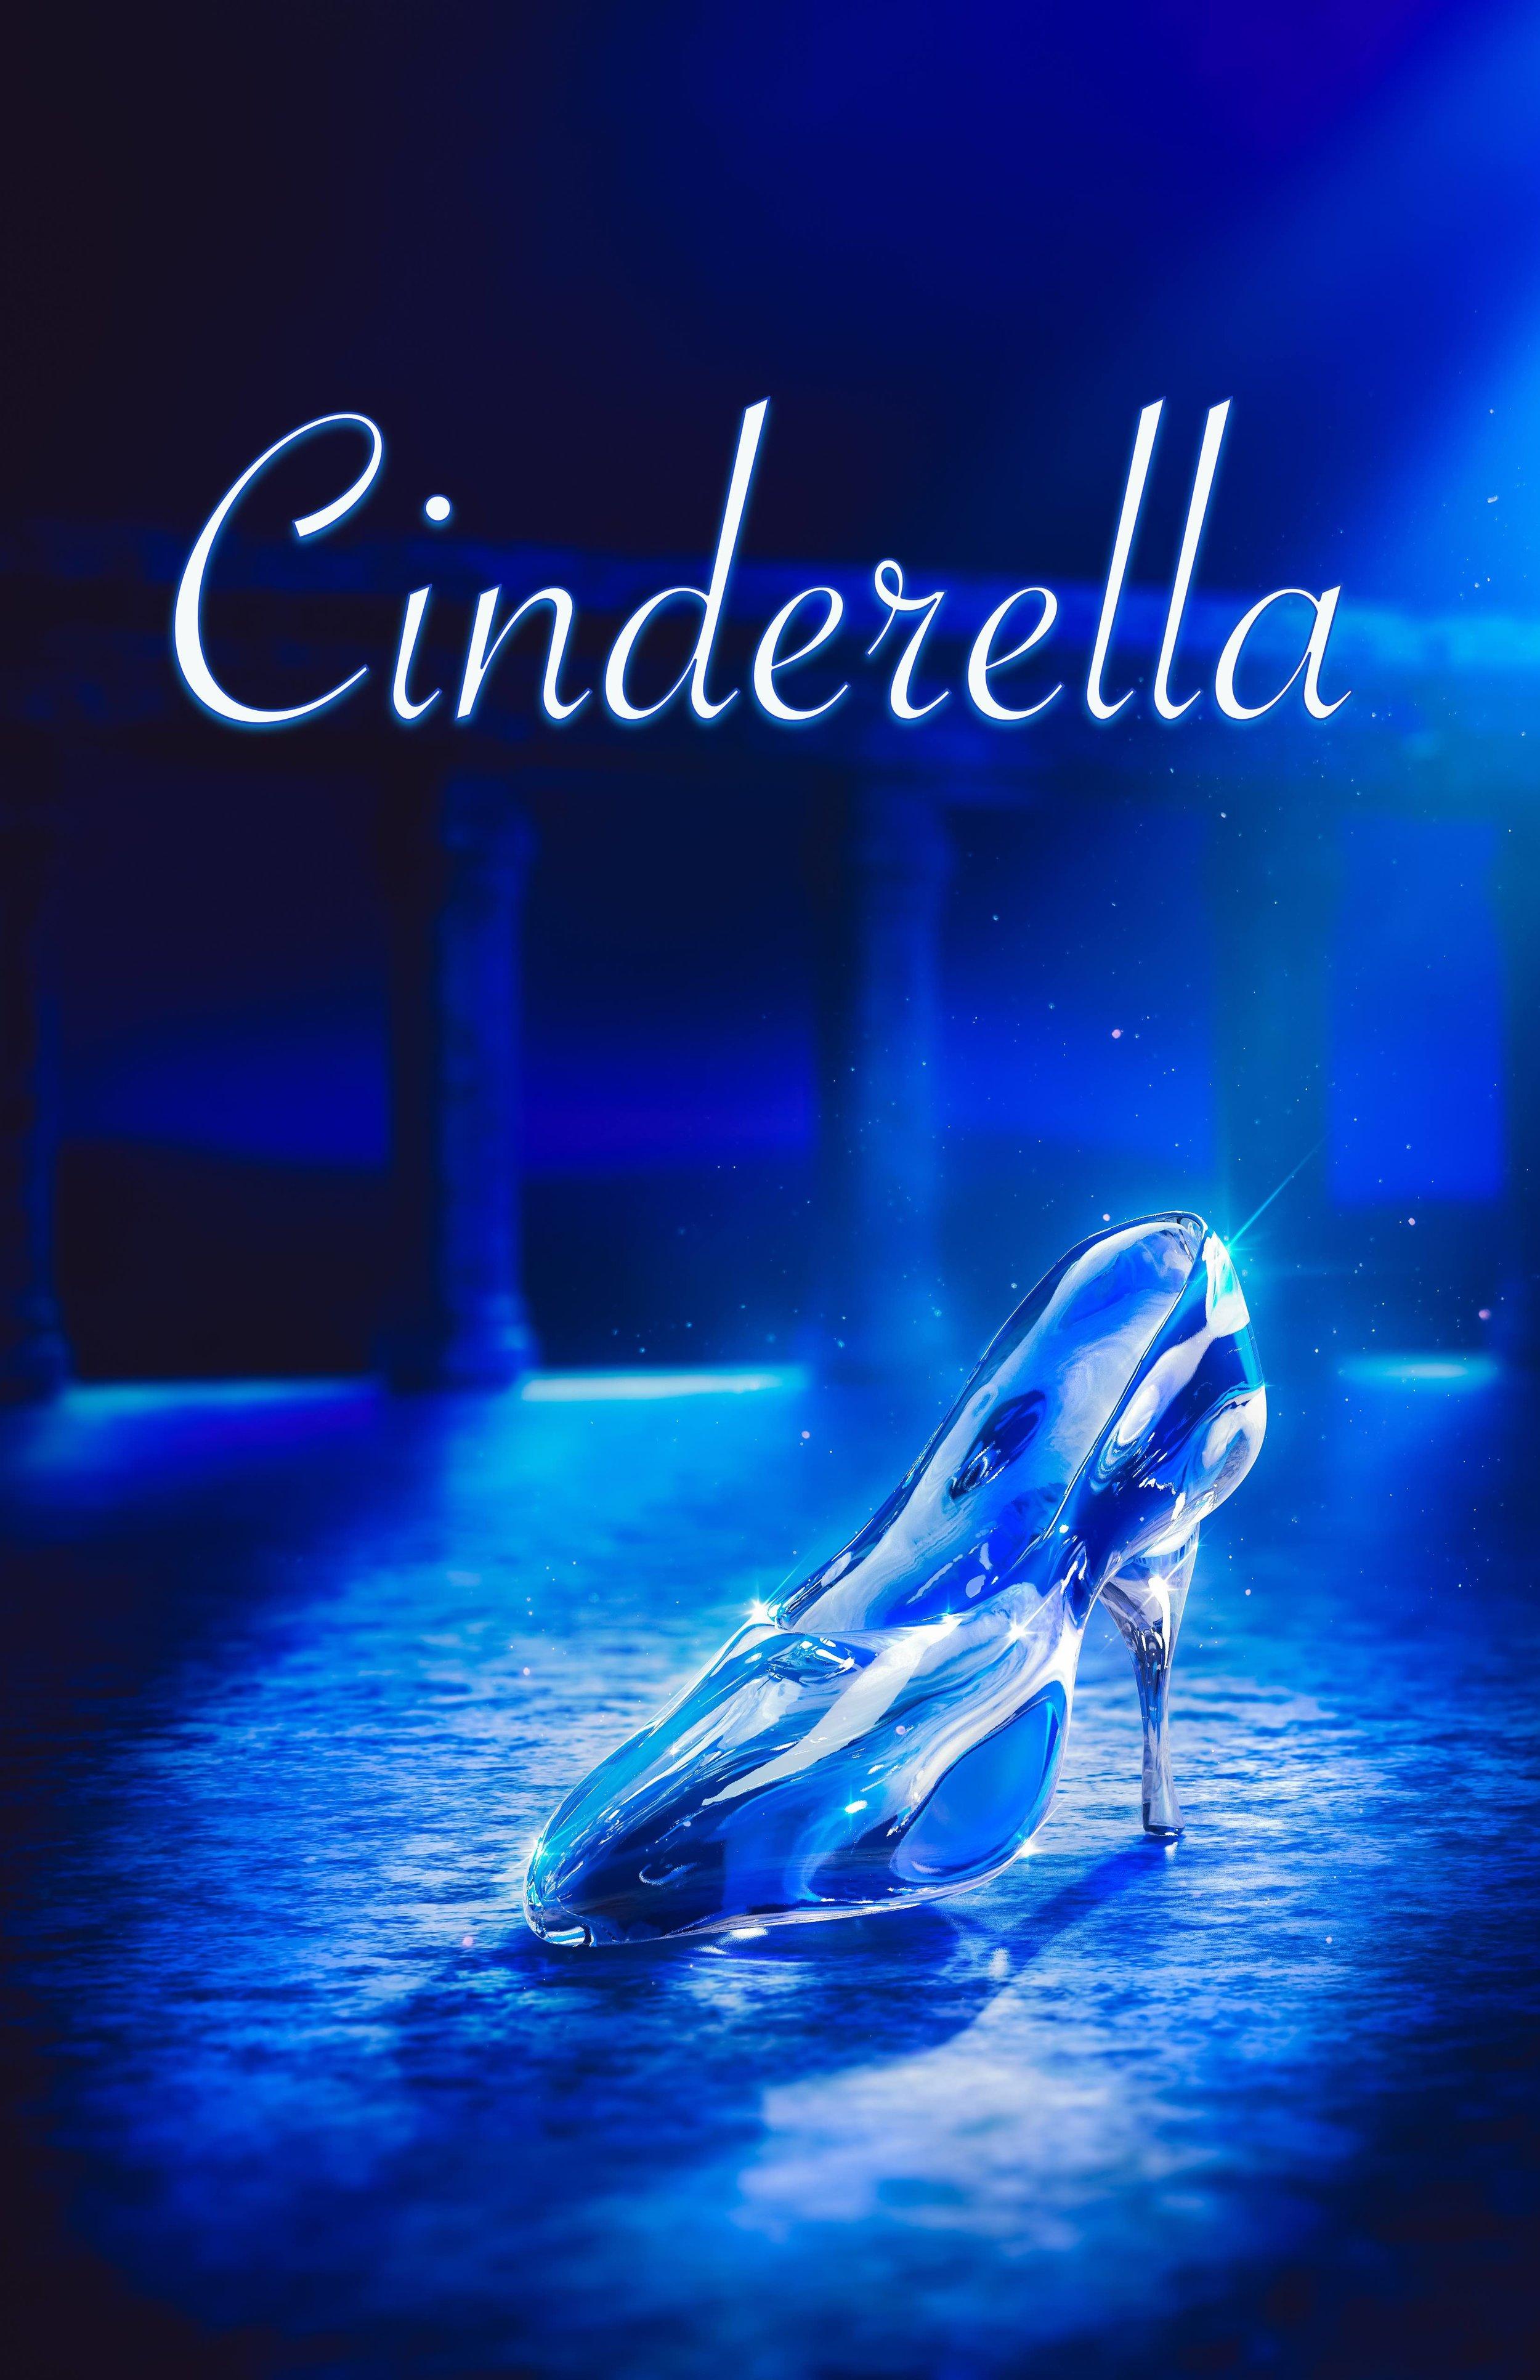 Cinderella Art copy.jpg